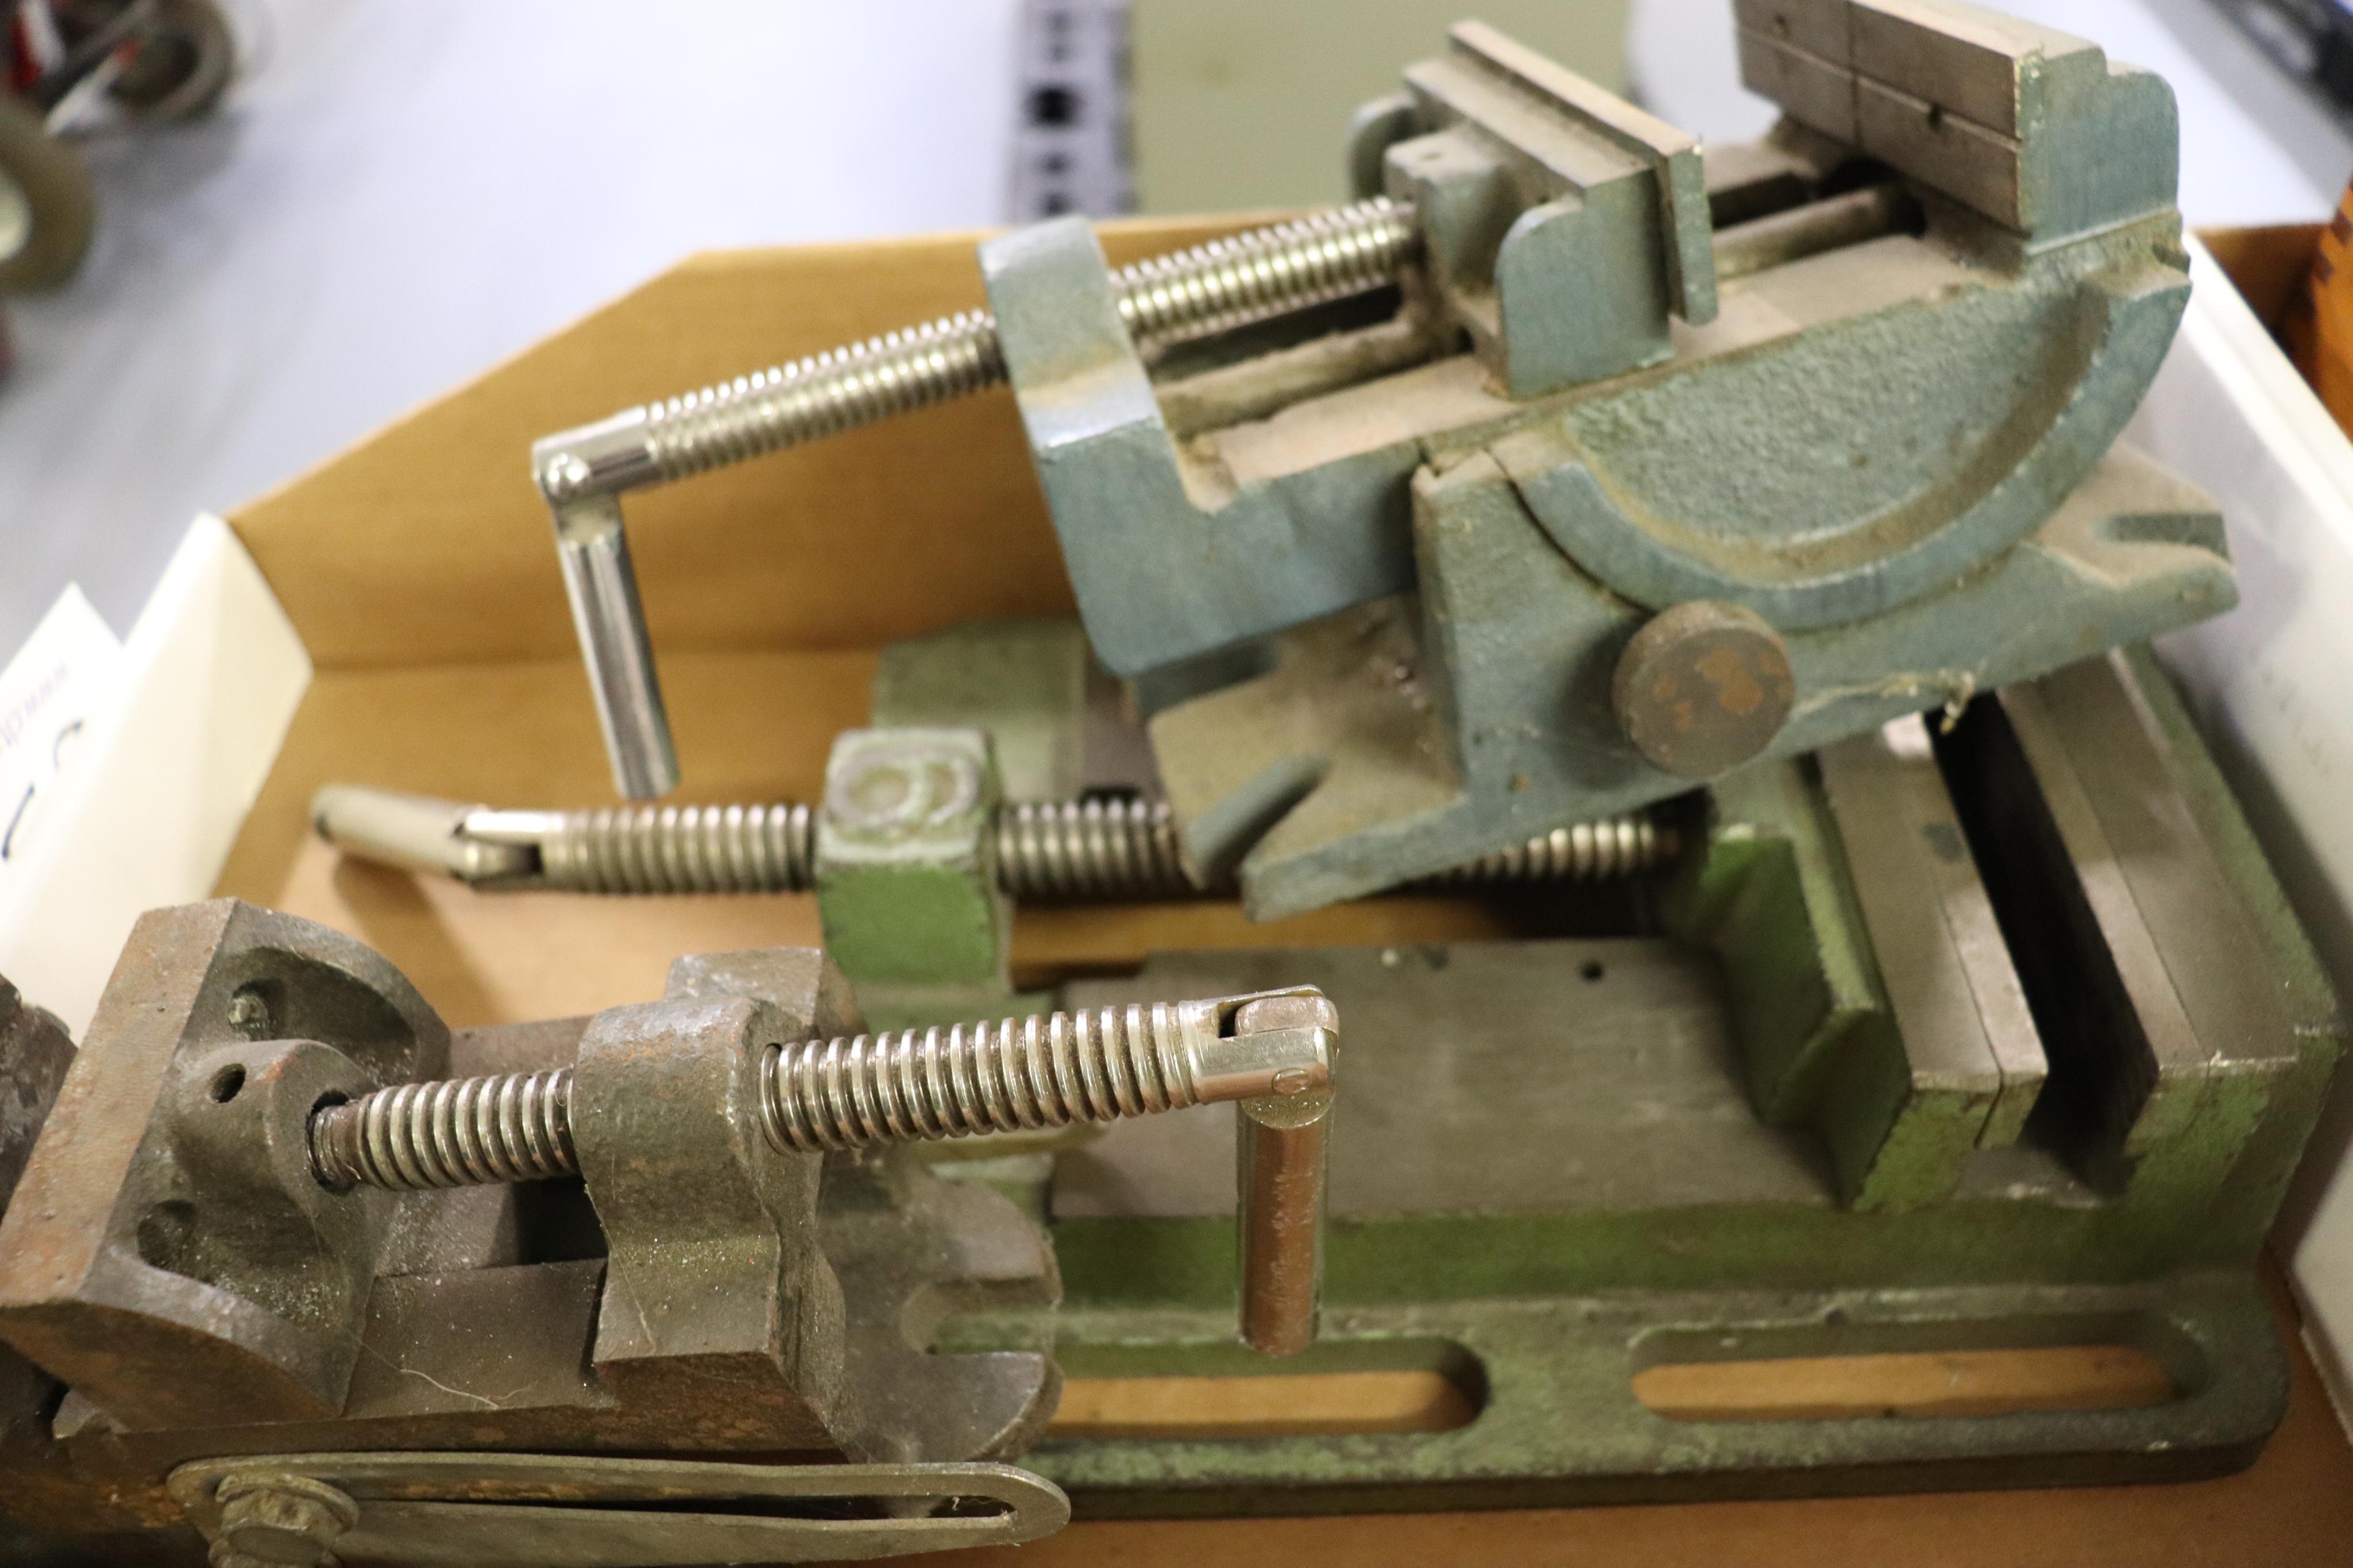 Drill press vises - Image 3 of 3